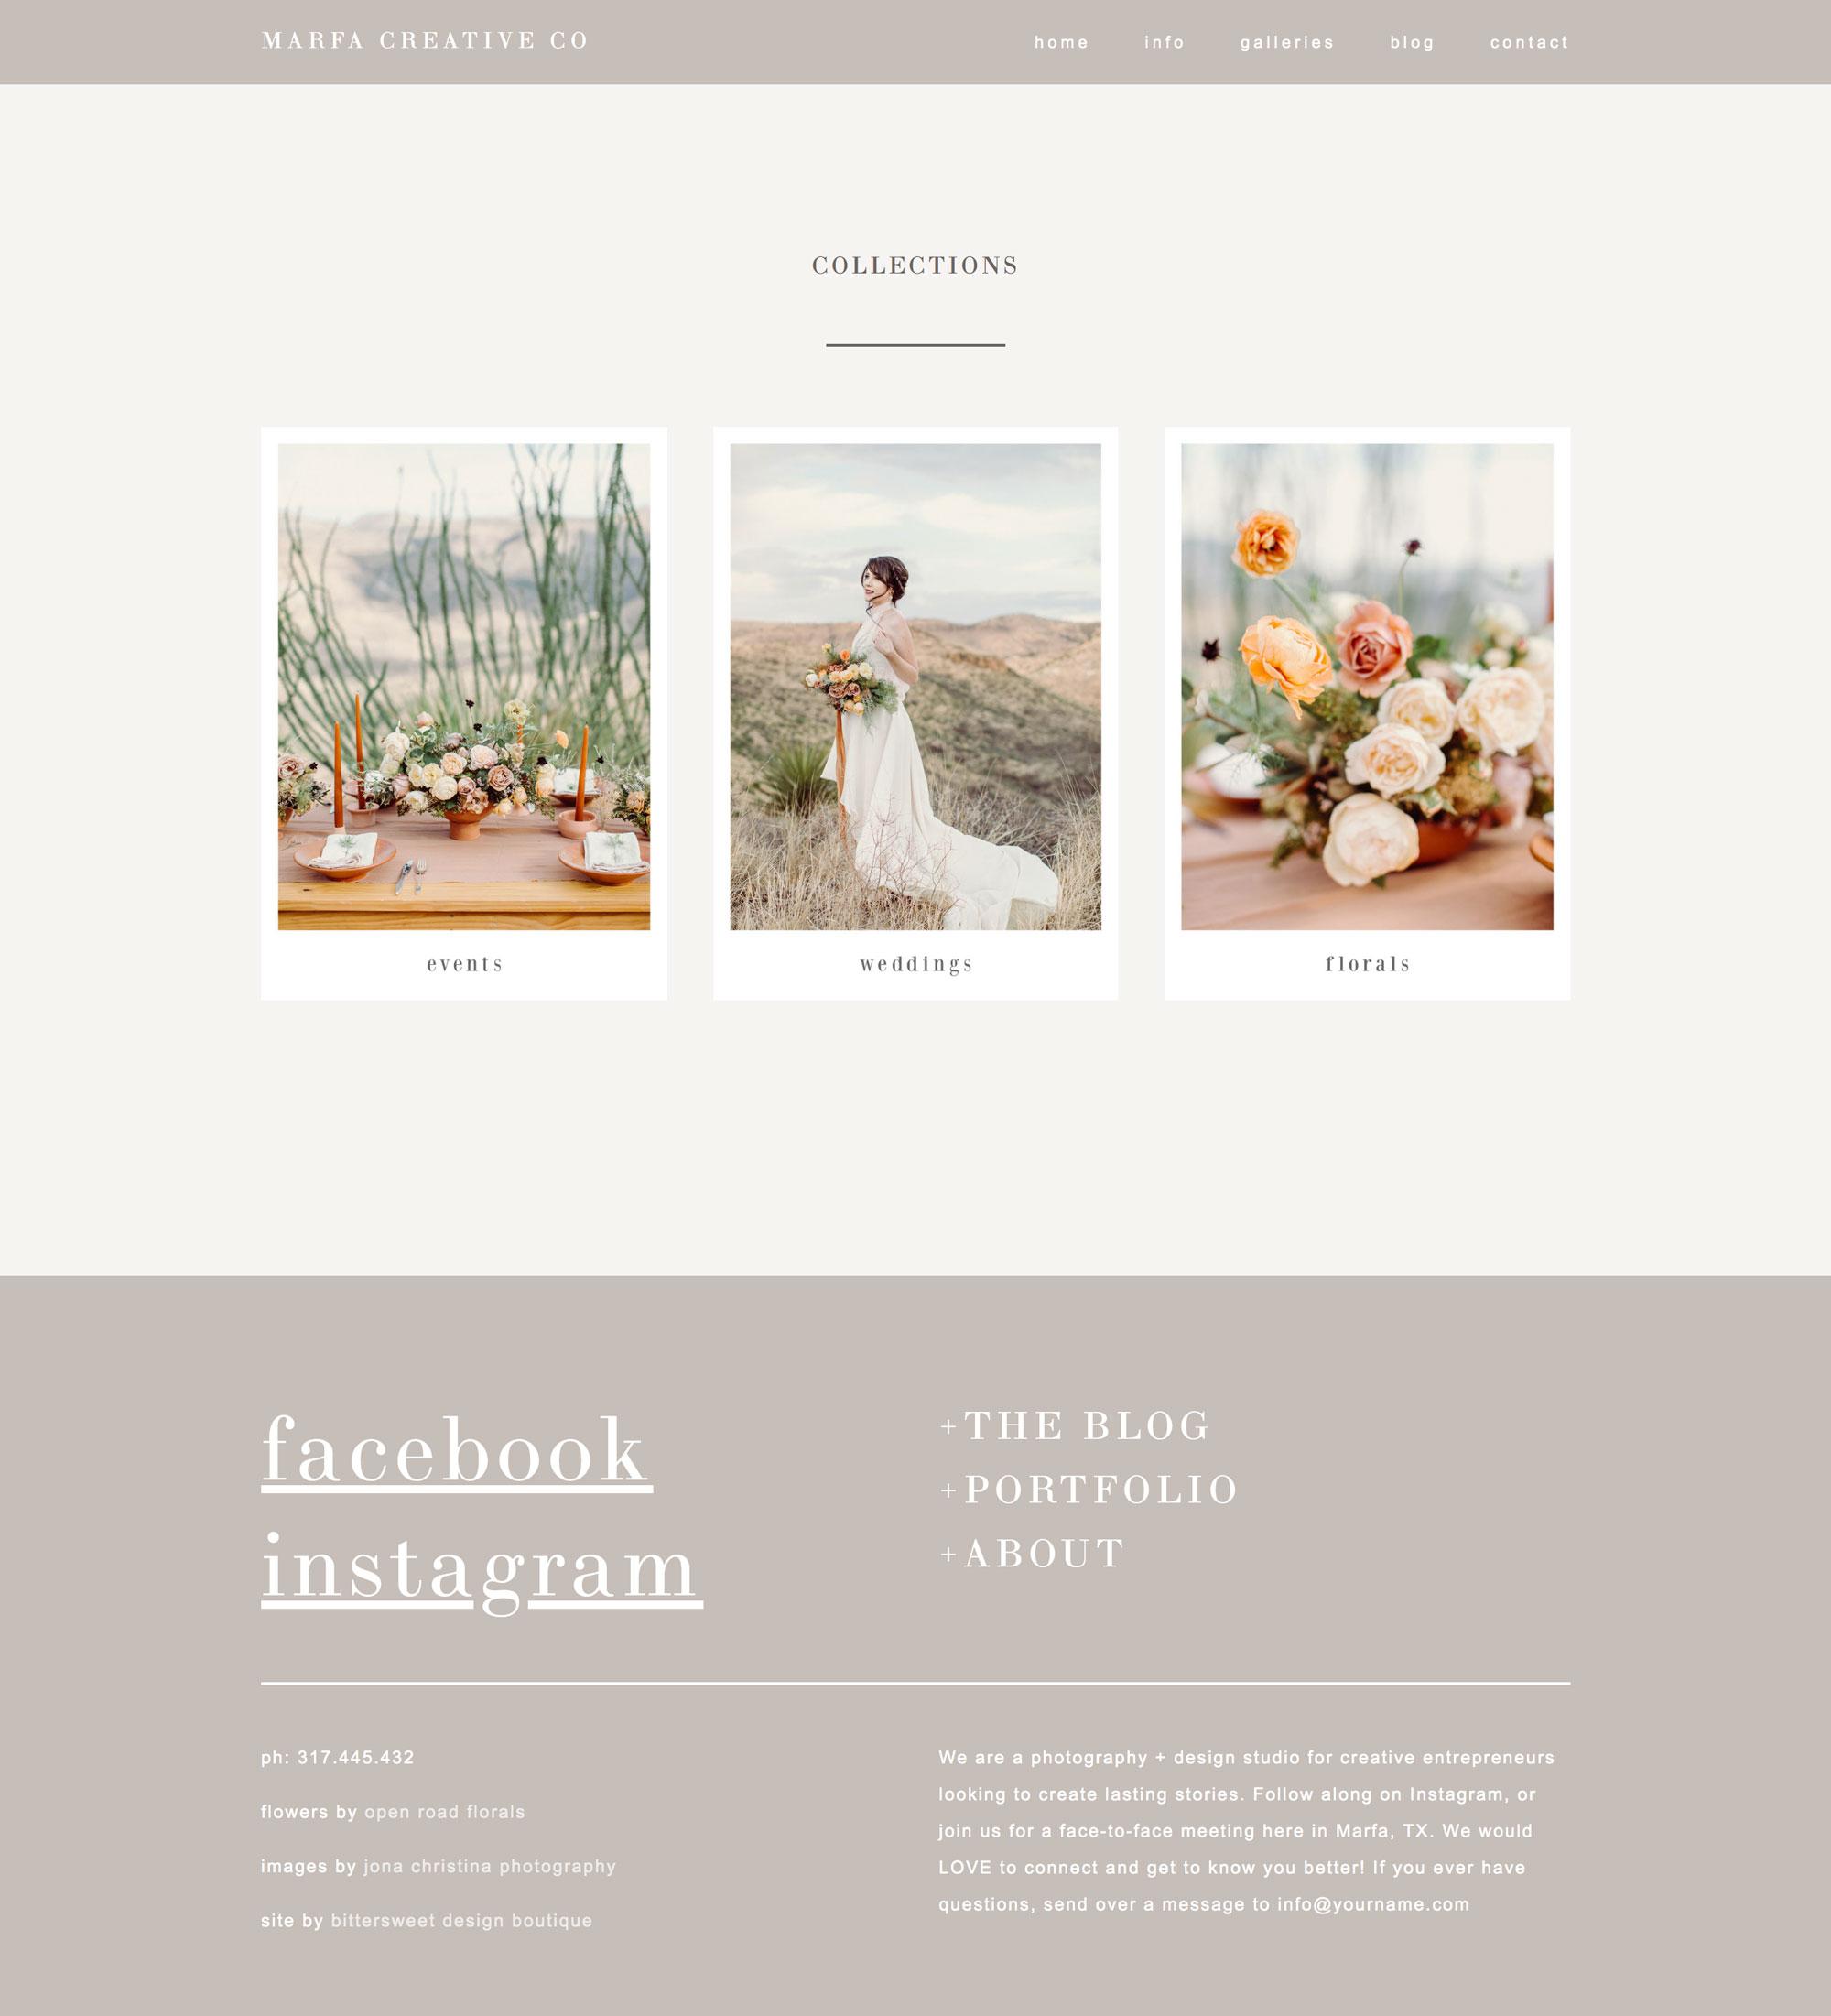 Squarespace website templates for photographers & bloggers | wedding photographer website design ideas